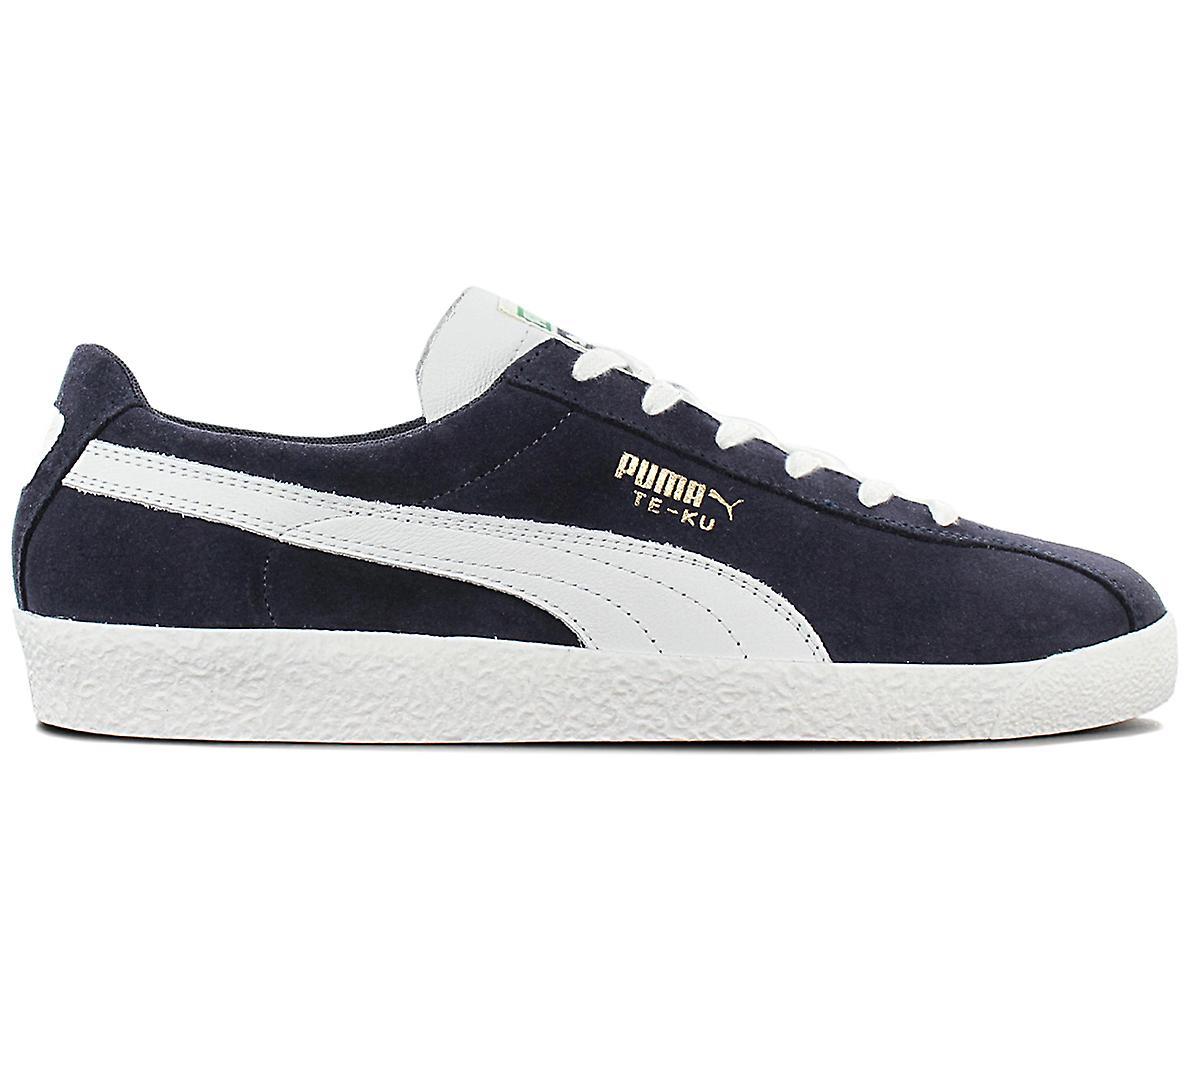 Puma Te-Ku Prime 366679-05 Herren Schuhe Blau Sneakers Sportschuhe   Fruugo  TR